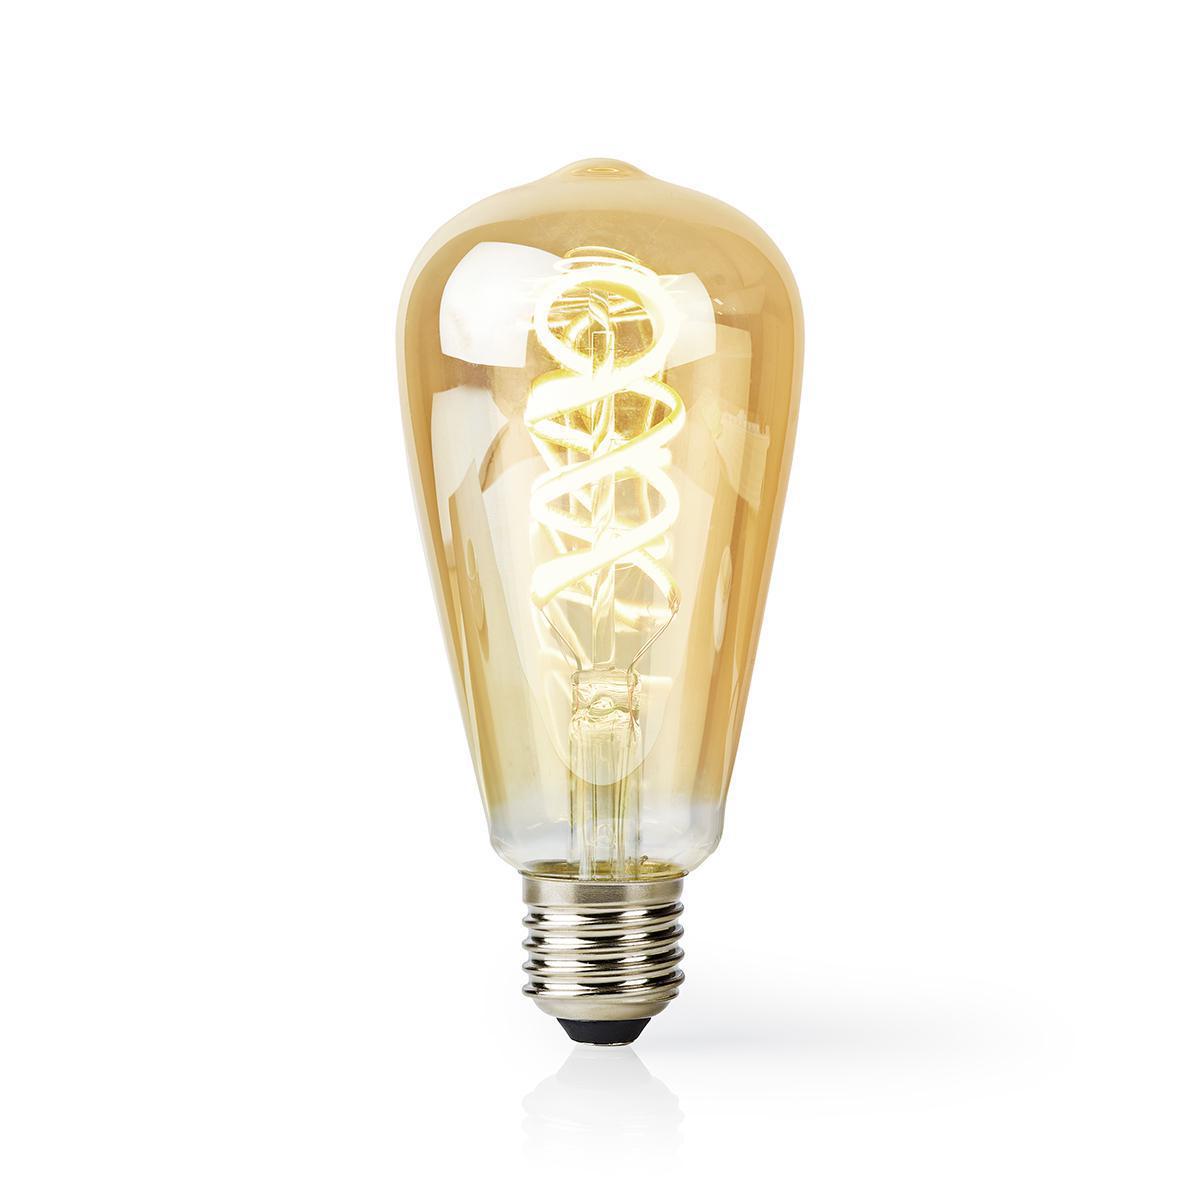 Slimme Led Edison Lamp met wifi E27 fitting 1800K - 6500K - lamp aan